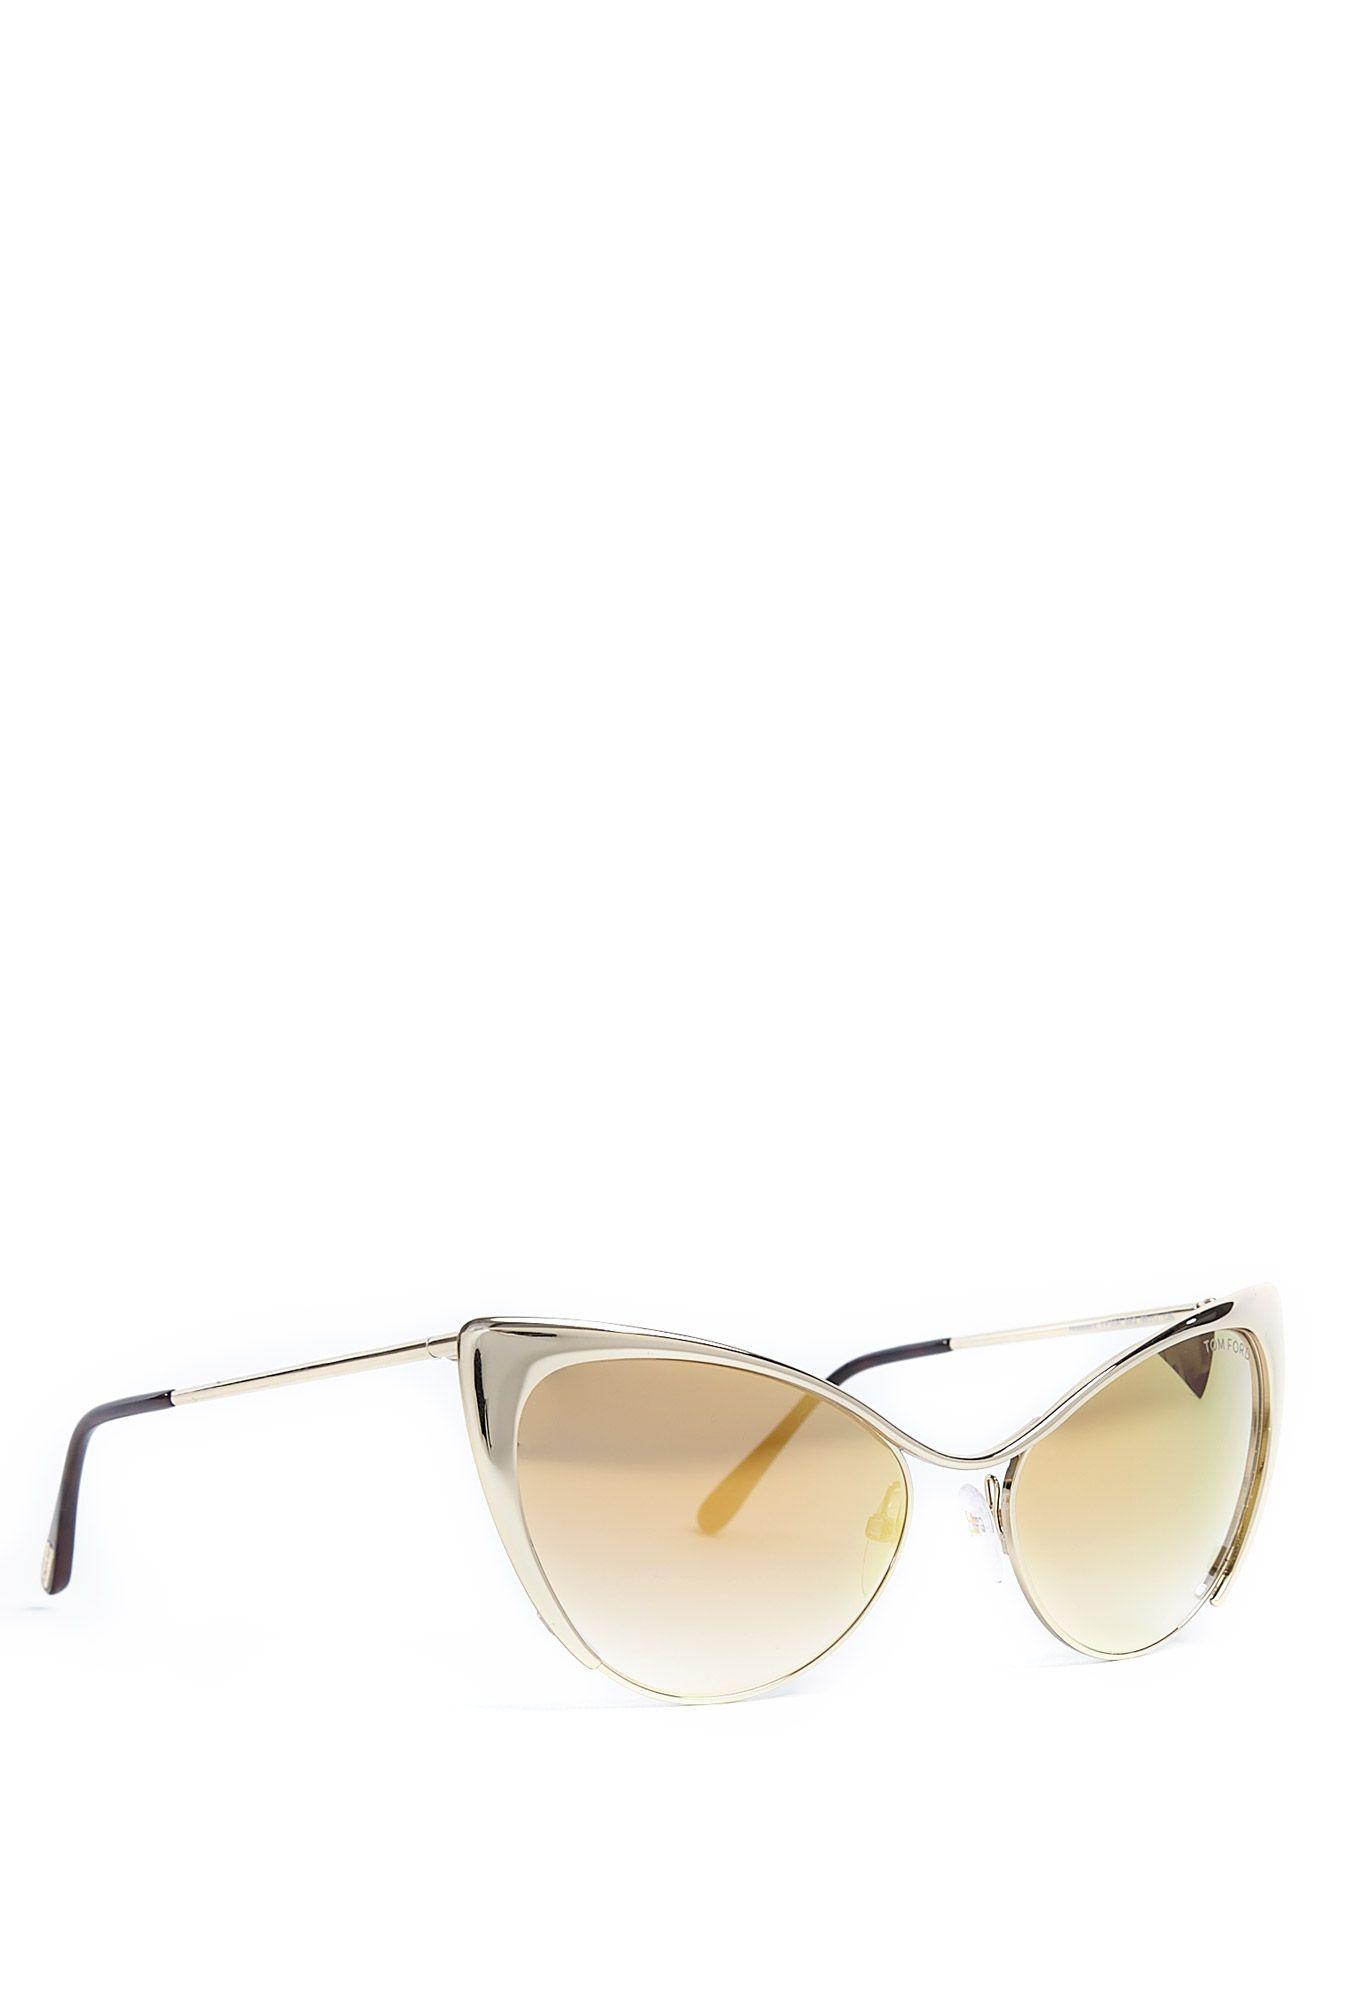 7aeda12abf7 Nastasya Cat Eye Frame Gold Lens Sunglasses by Tom Ford